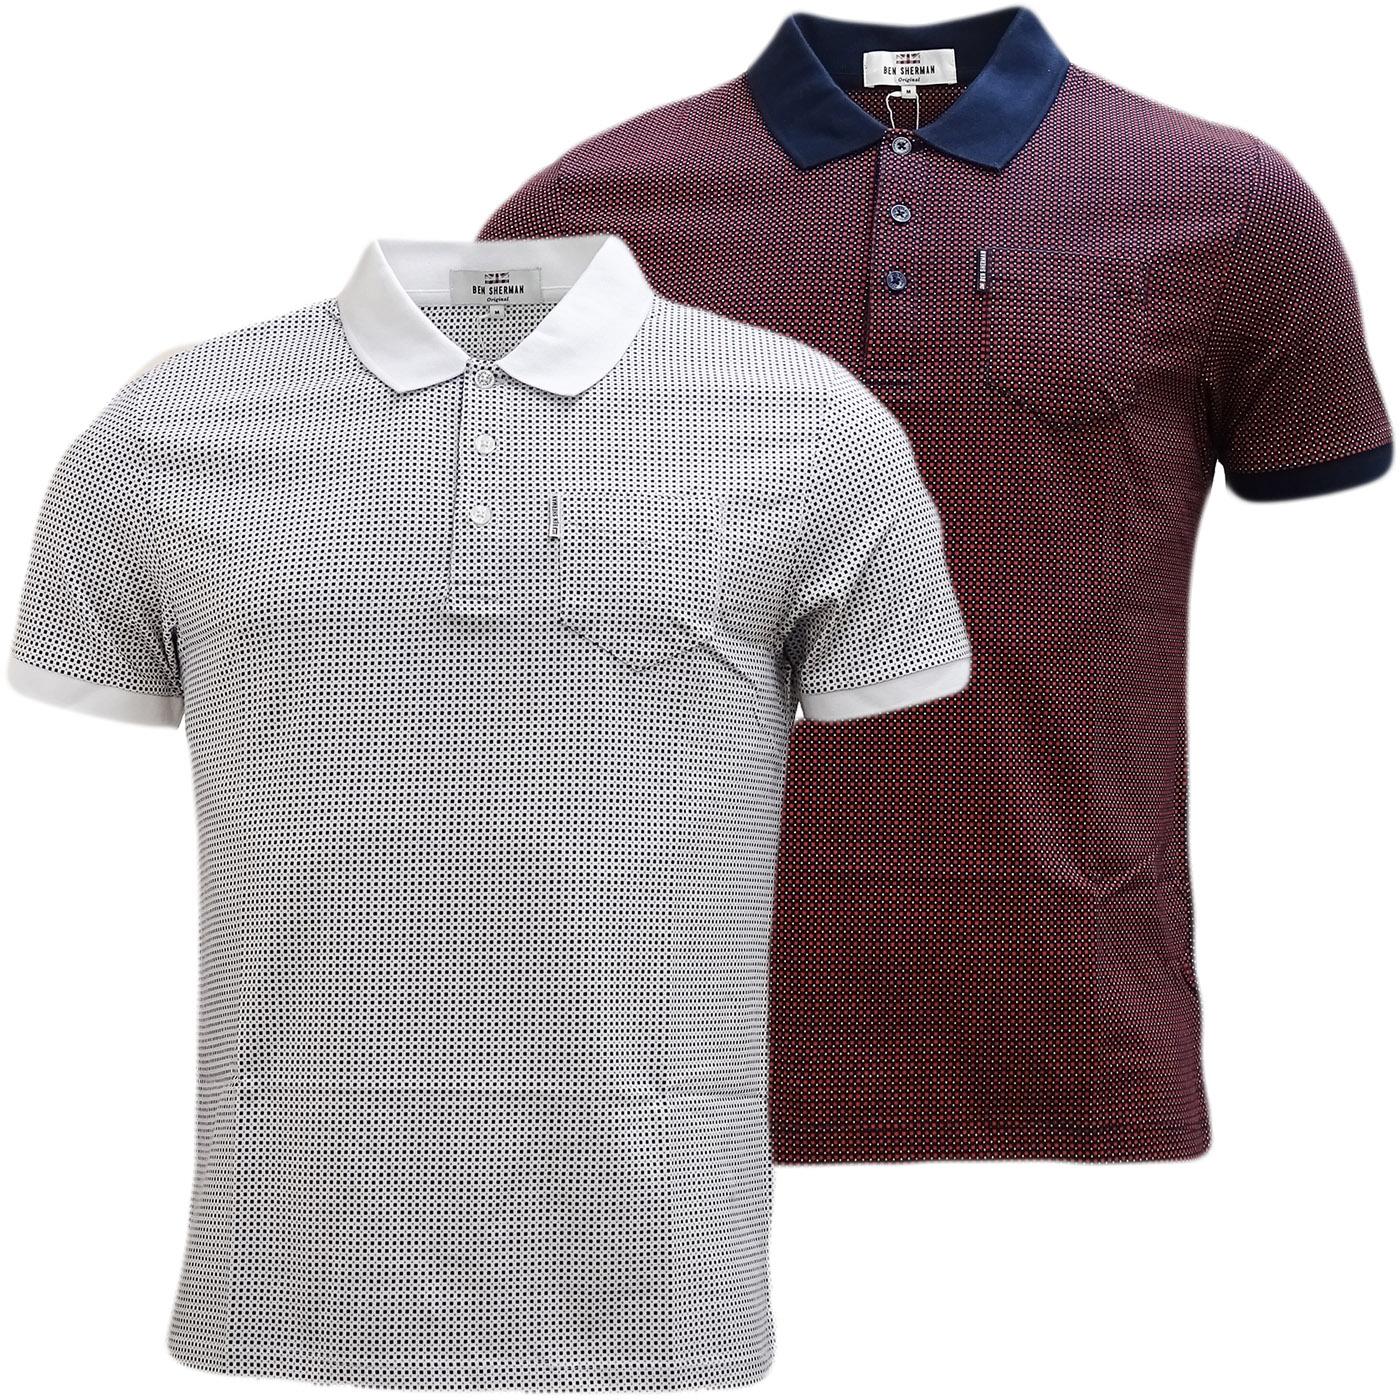 Ben Sherman Square Mod / Retro Polo Shirt - Mc13432